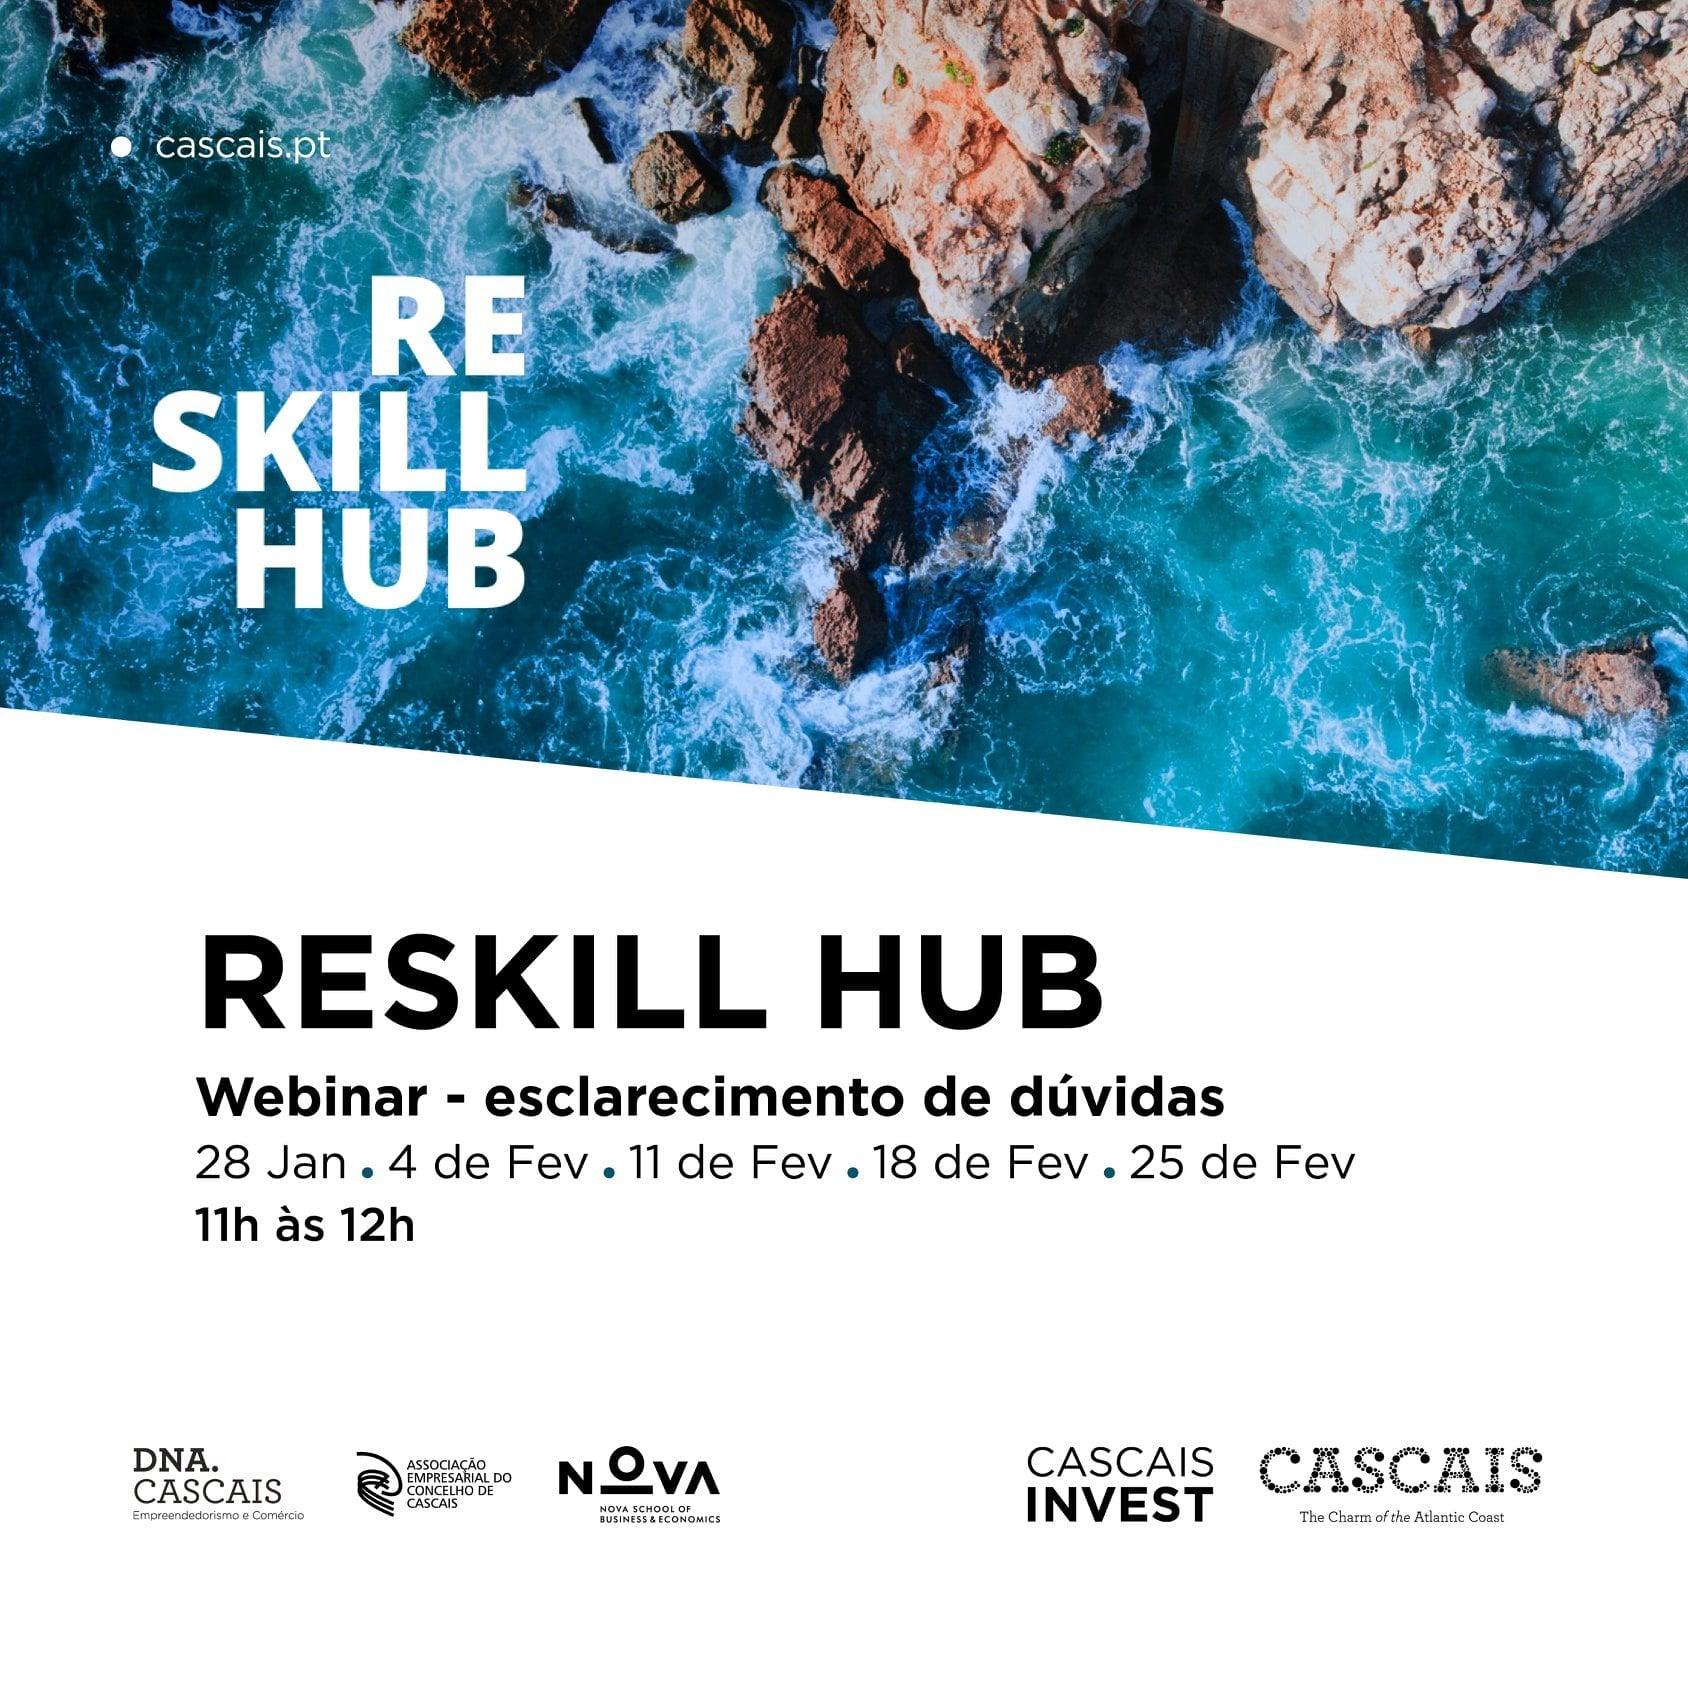 A Cascais Invest apresenta o RESKILL HUB